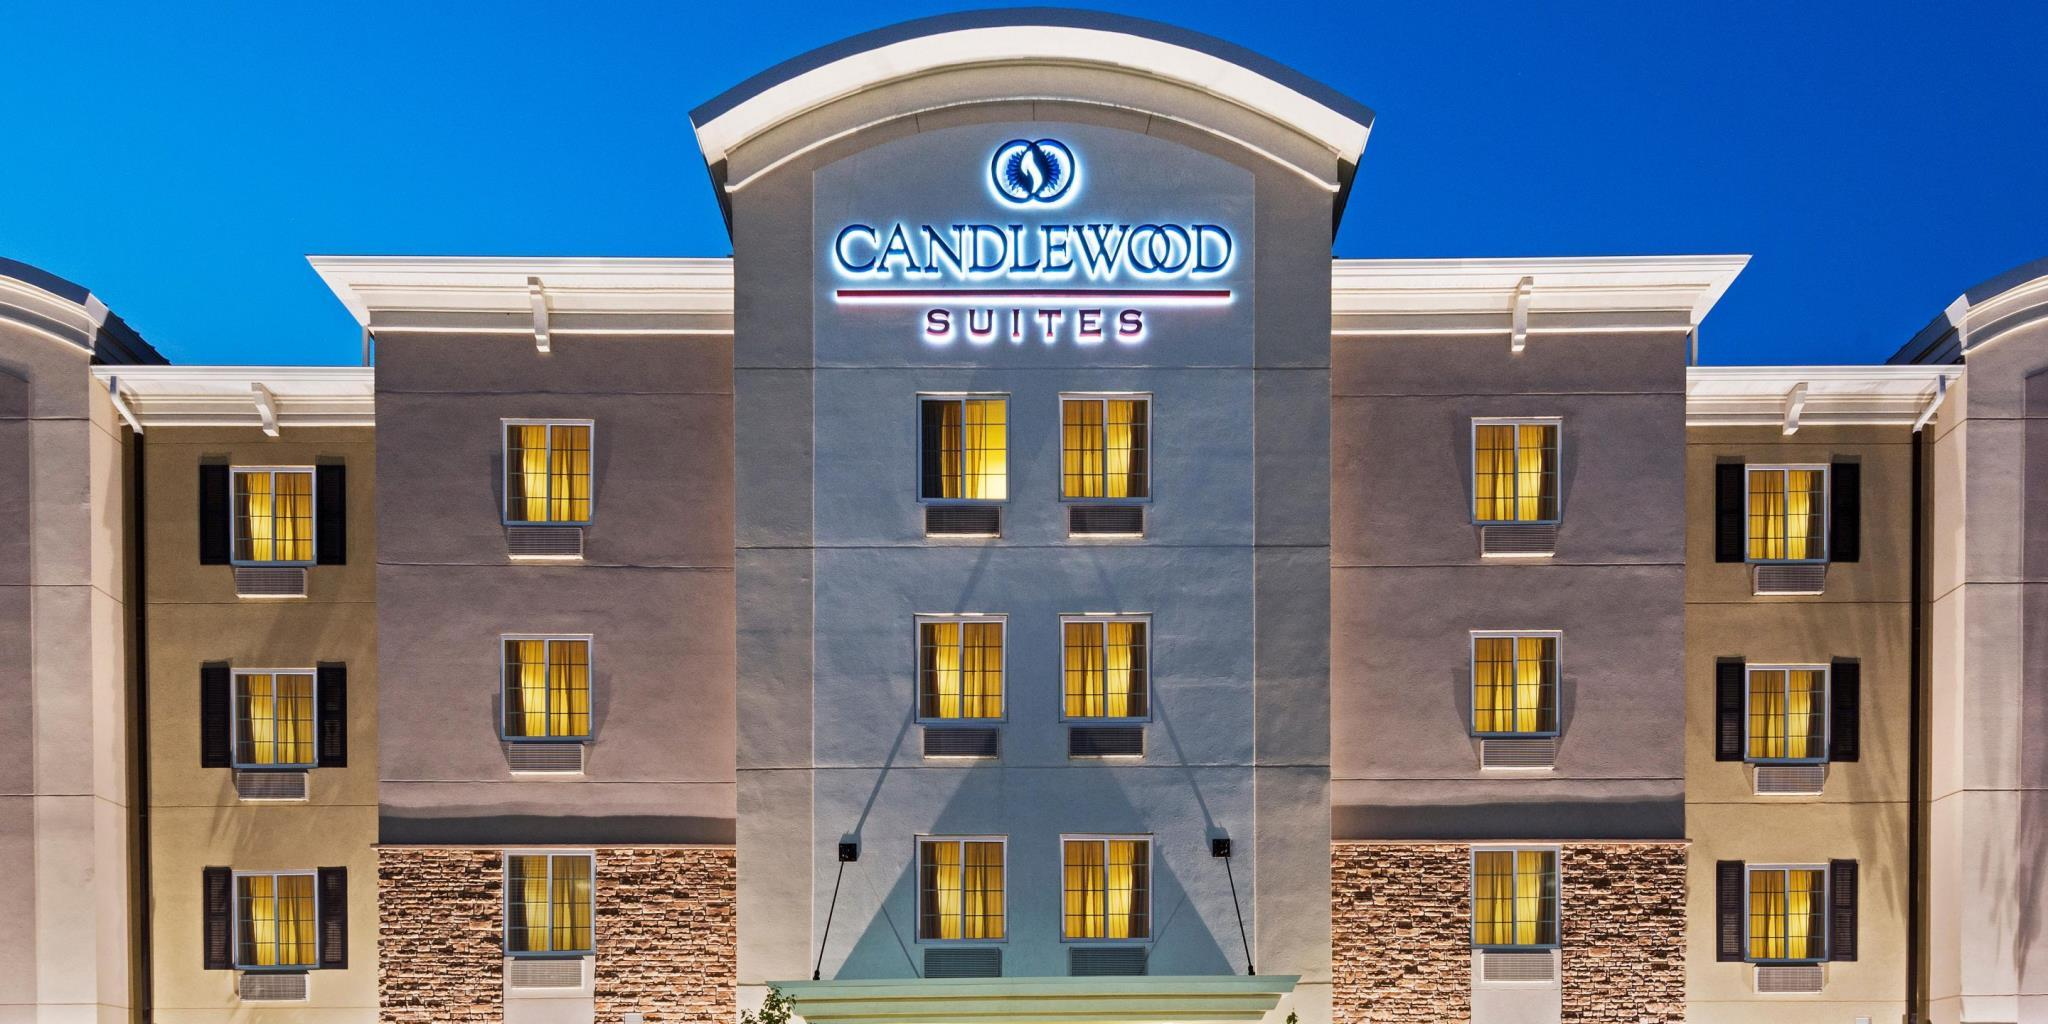 Candlewood Suites Valdosta Mall